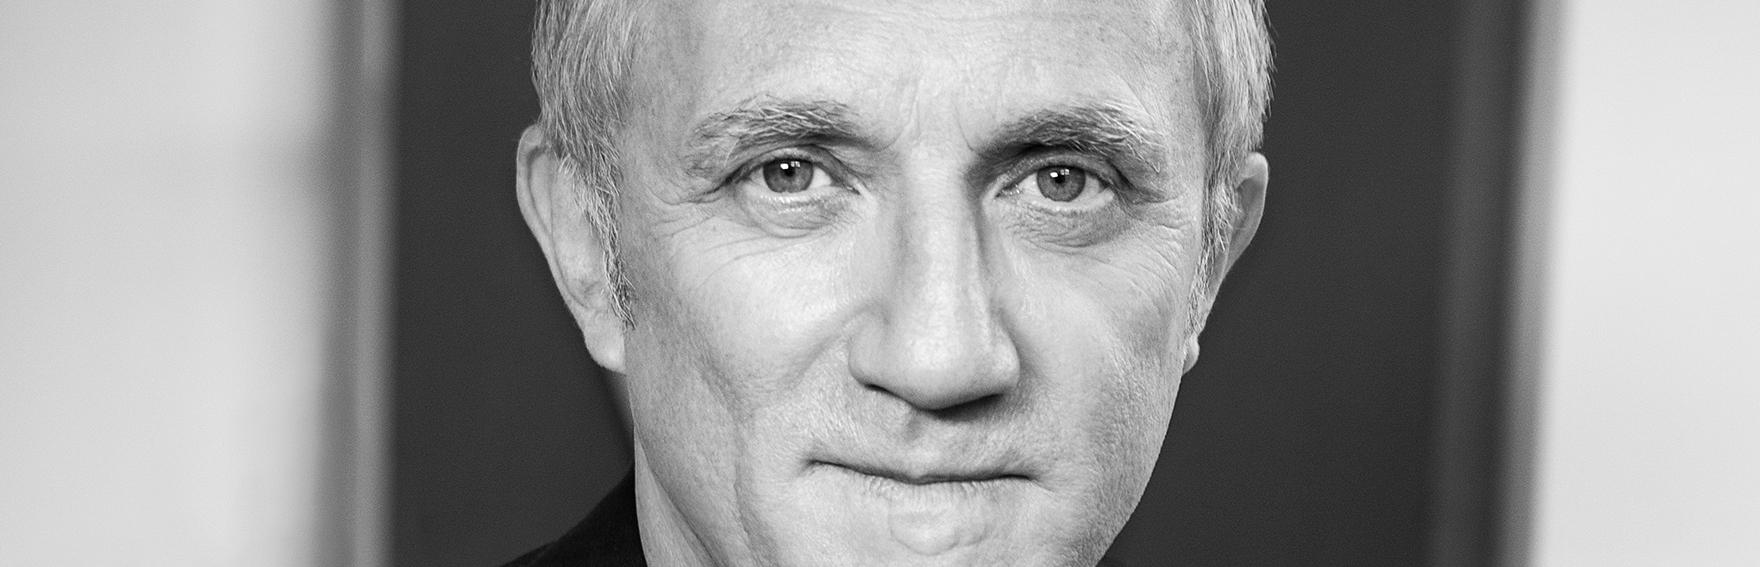 François-Henri Pinault ケリング会長兼CEO